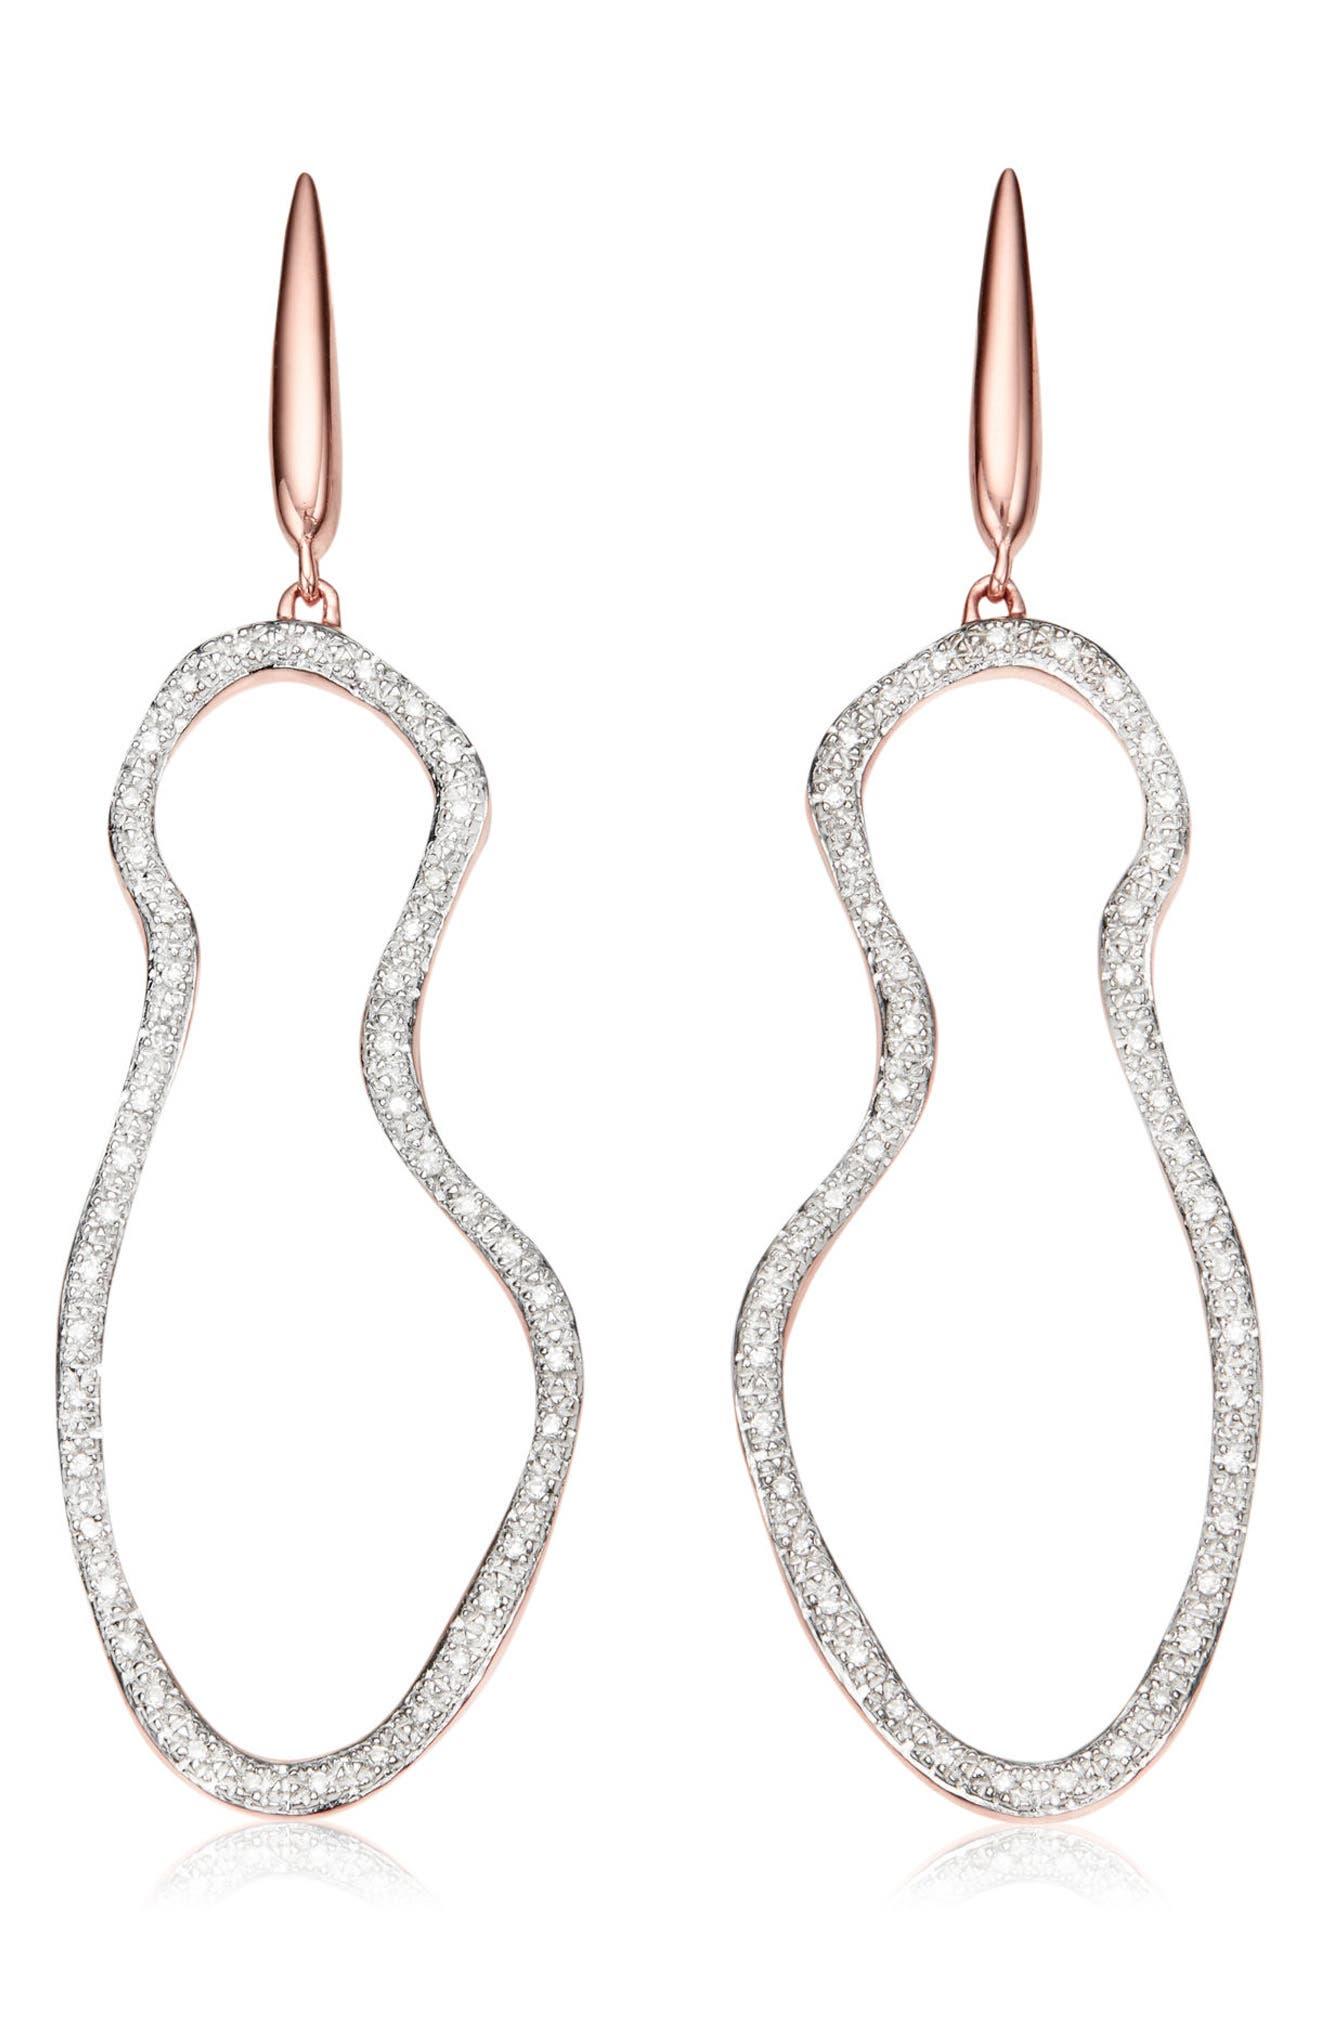 Riva Diamond Drop Earrings,                         Main,                         color, Rose Gold/ Diamond